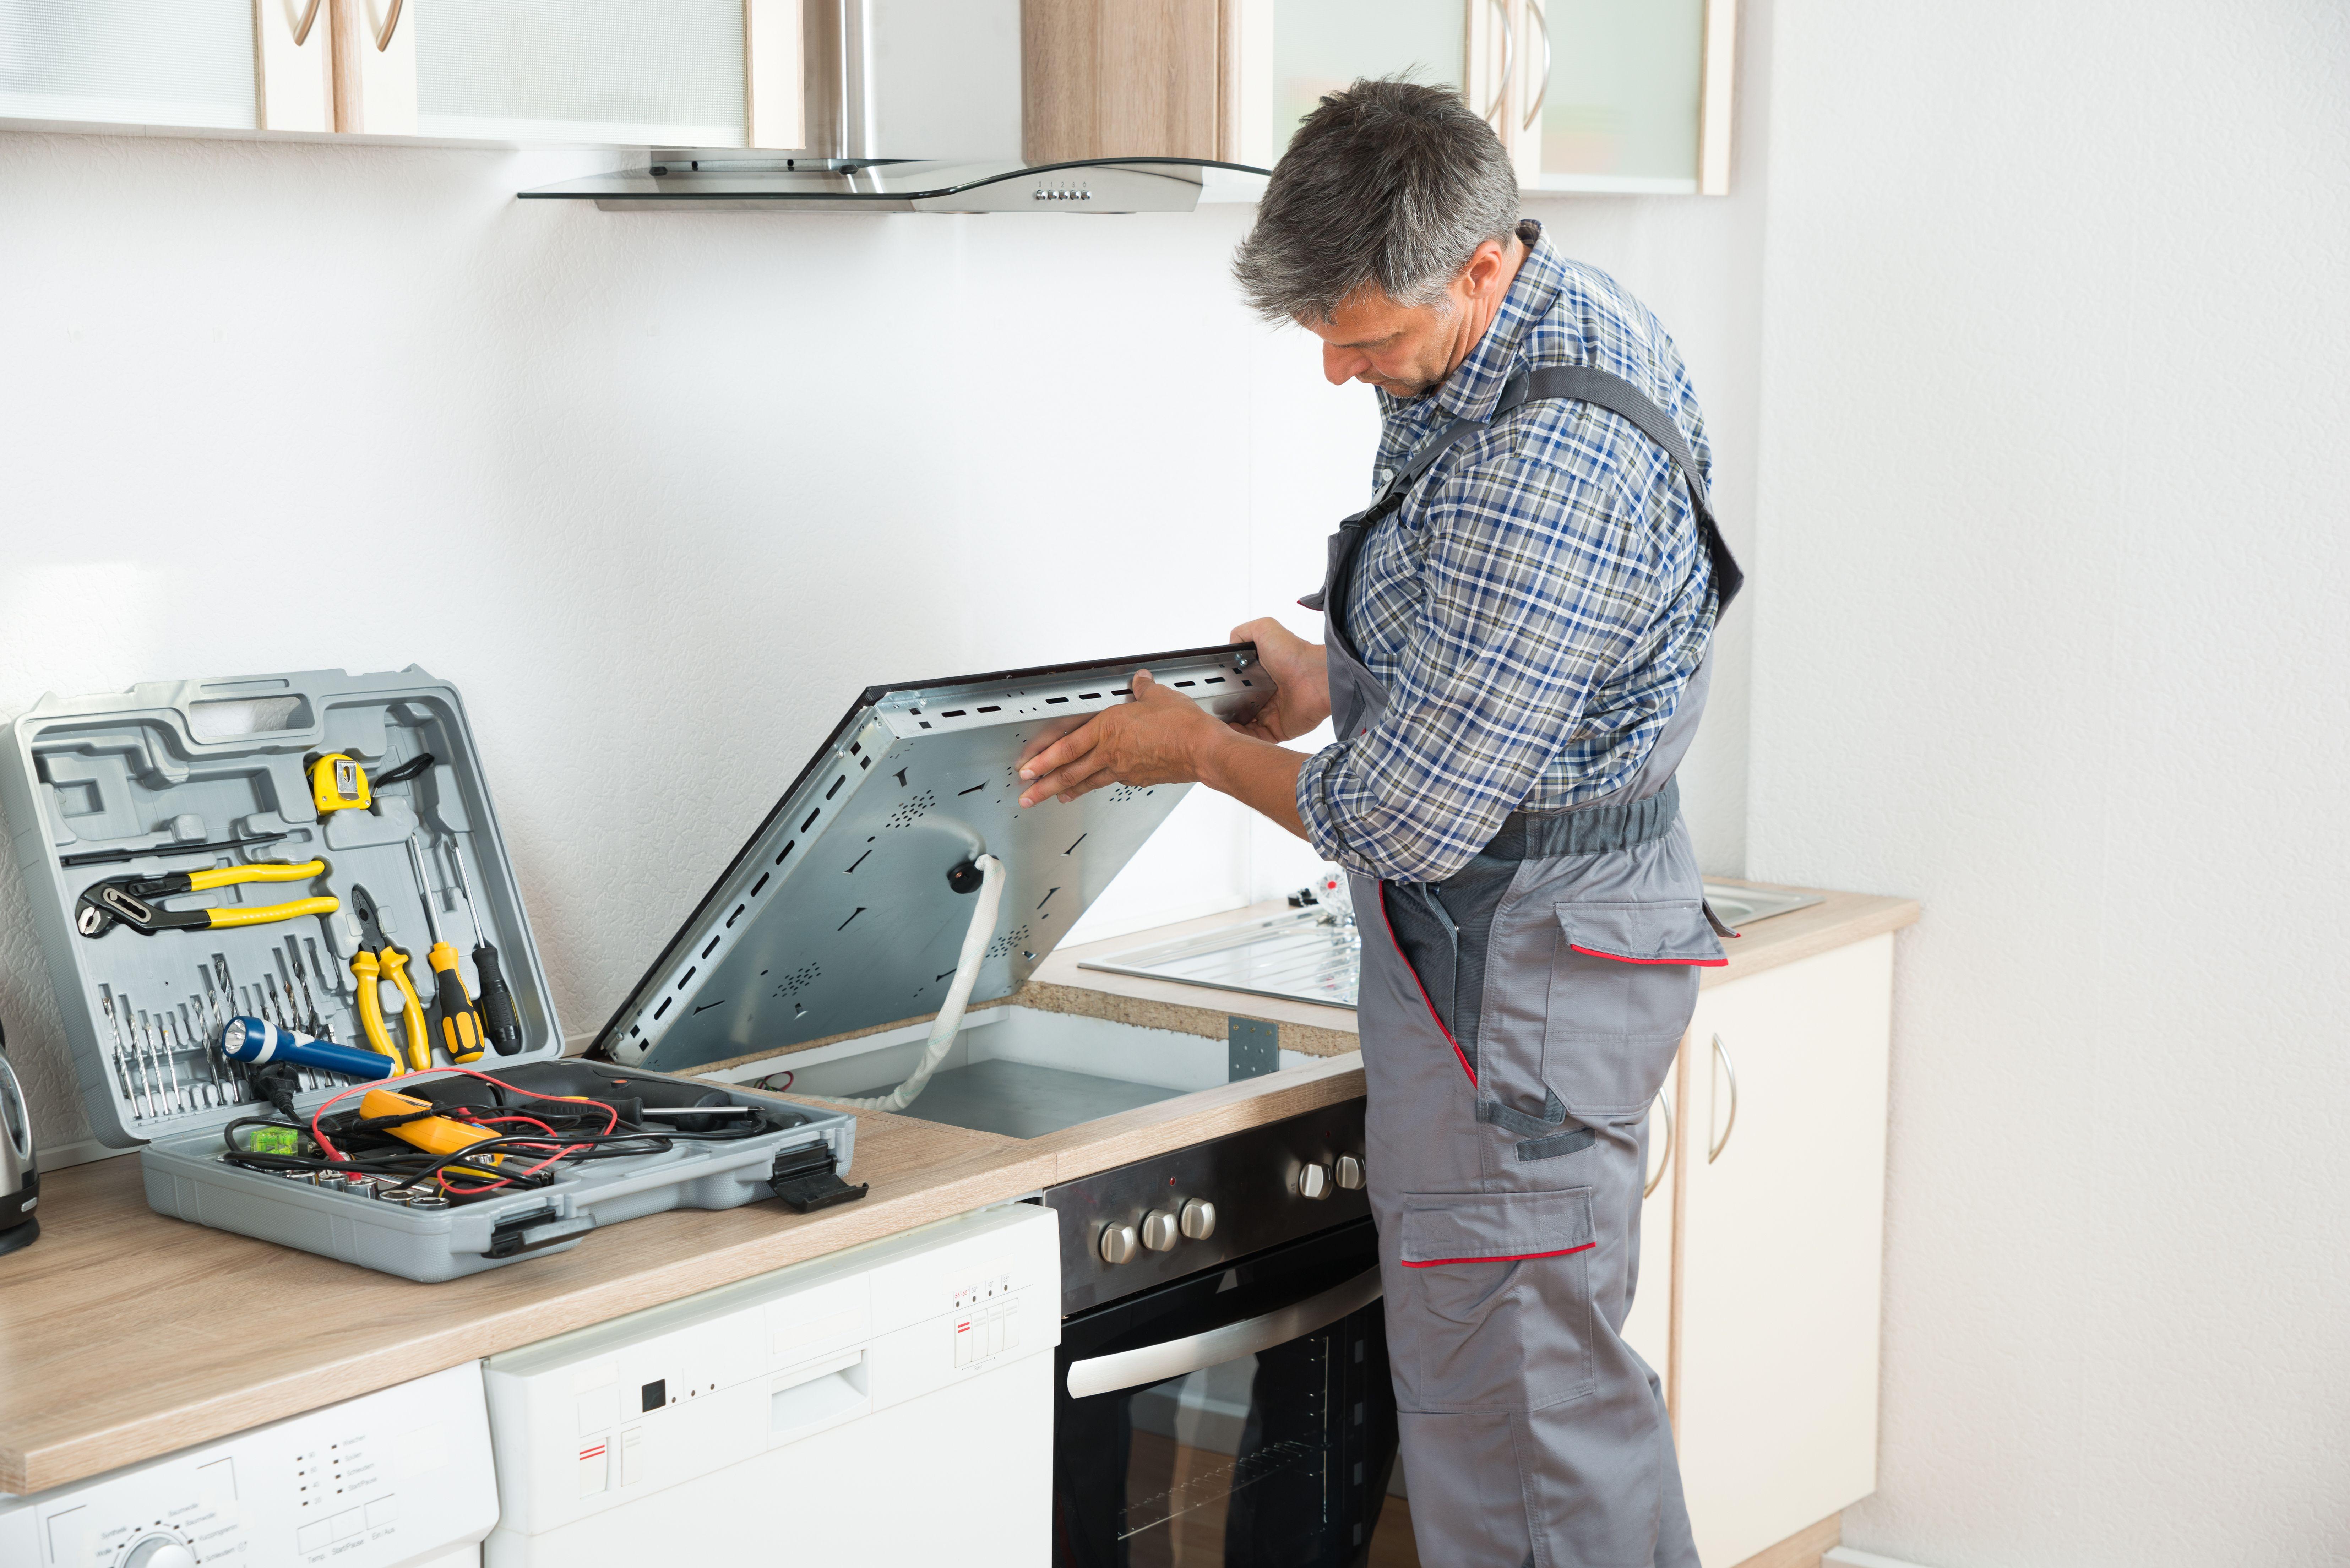 Reparación de cocinas: Servicios de Servicio Oficial AEG, Electrolux, Zanussi --963 500 221--